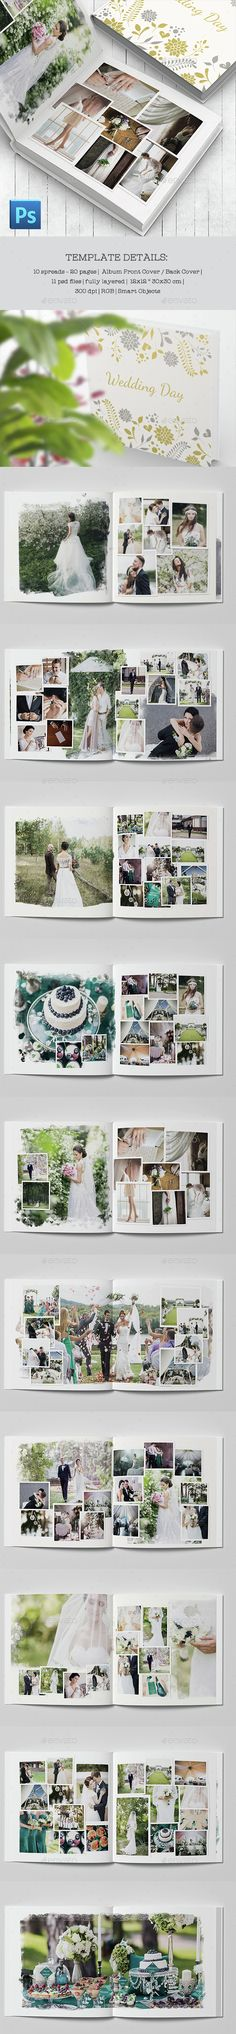 Wedding Photobook Template PSD. Download here: http://graphicriver.net/item/wedding-photobook-template/14911105?ref=ksioks